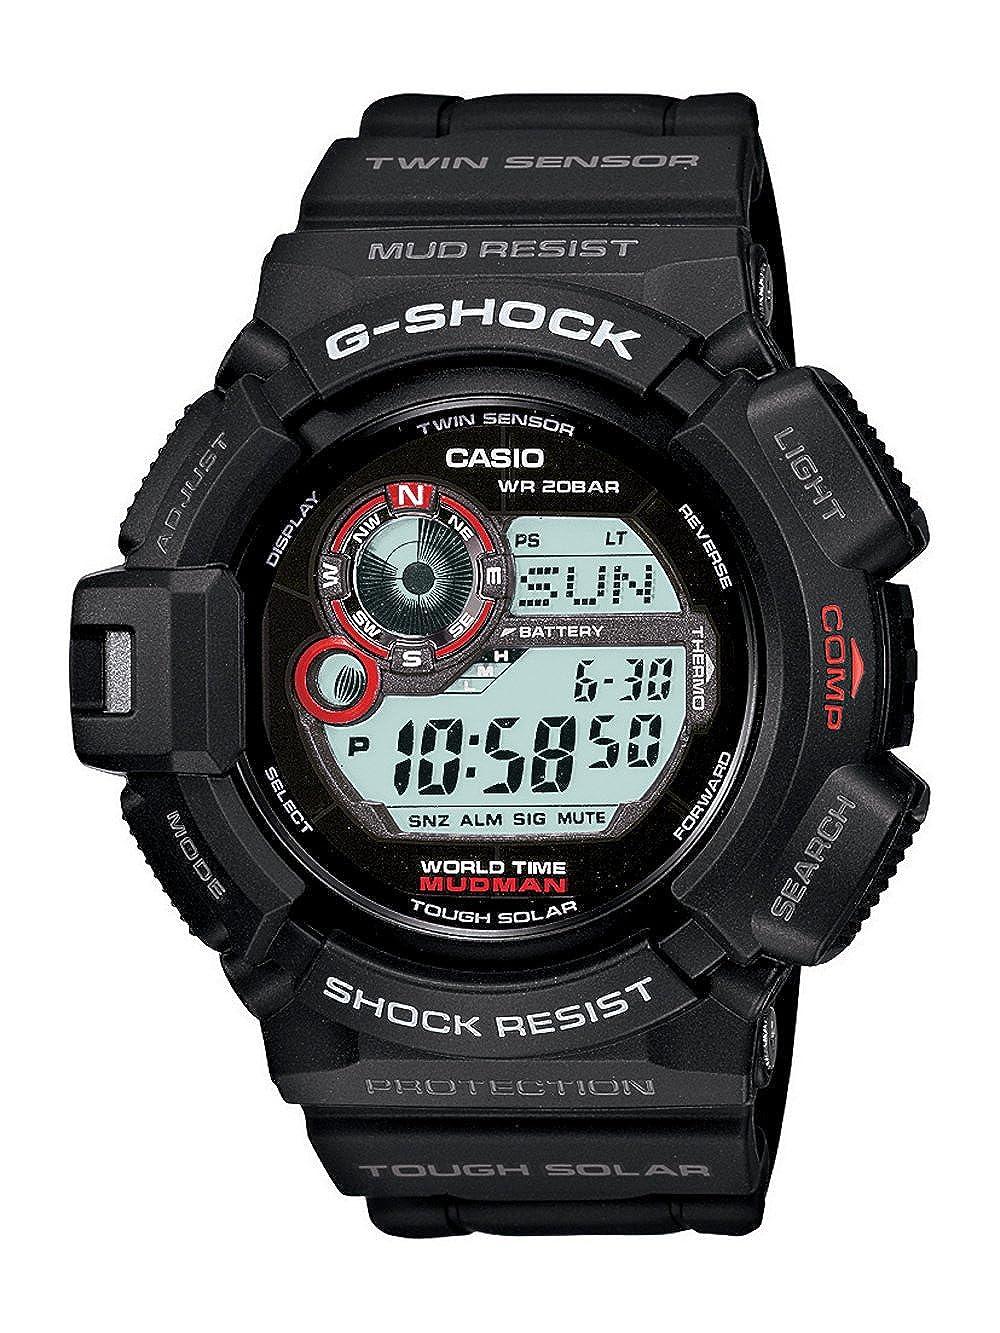 829e433bbe Casio Men's G9300-1 Mudman G-Shock Shock Resistant Multi-Function Sport  Watch